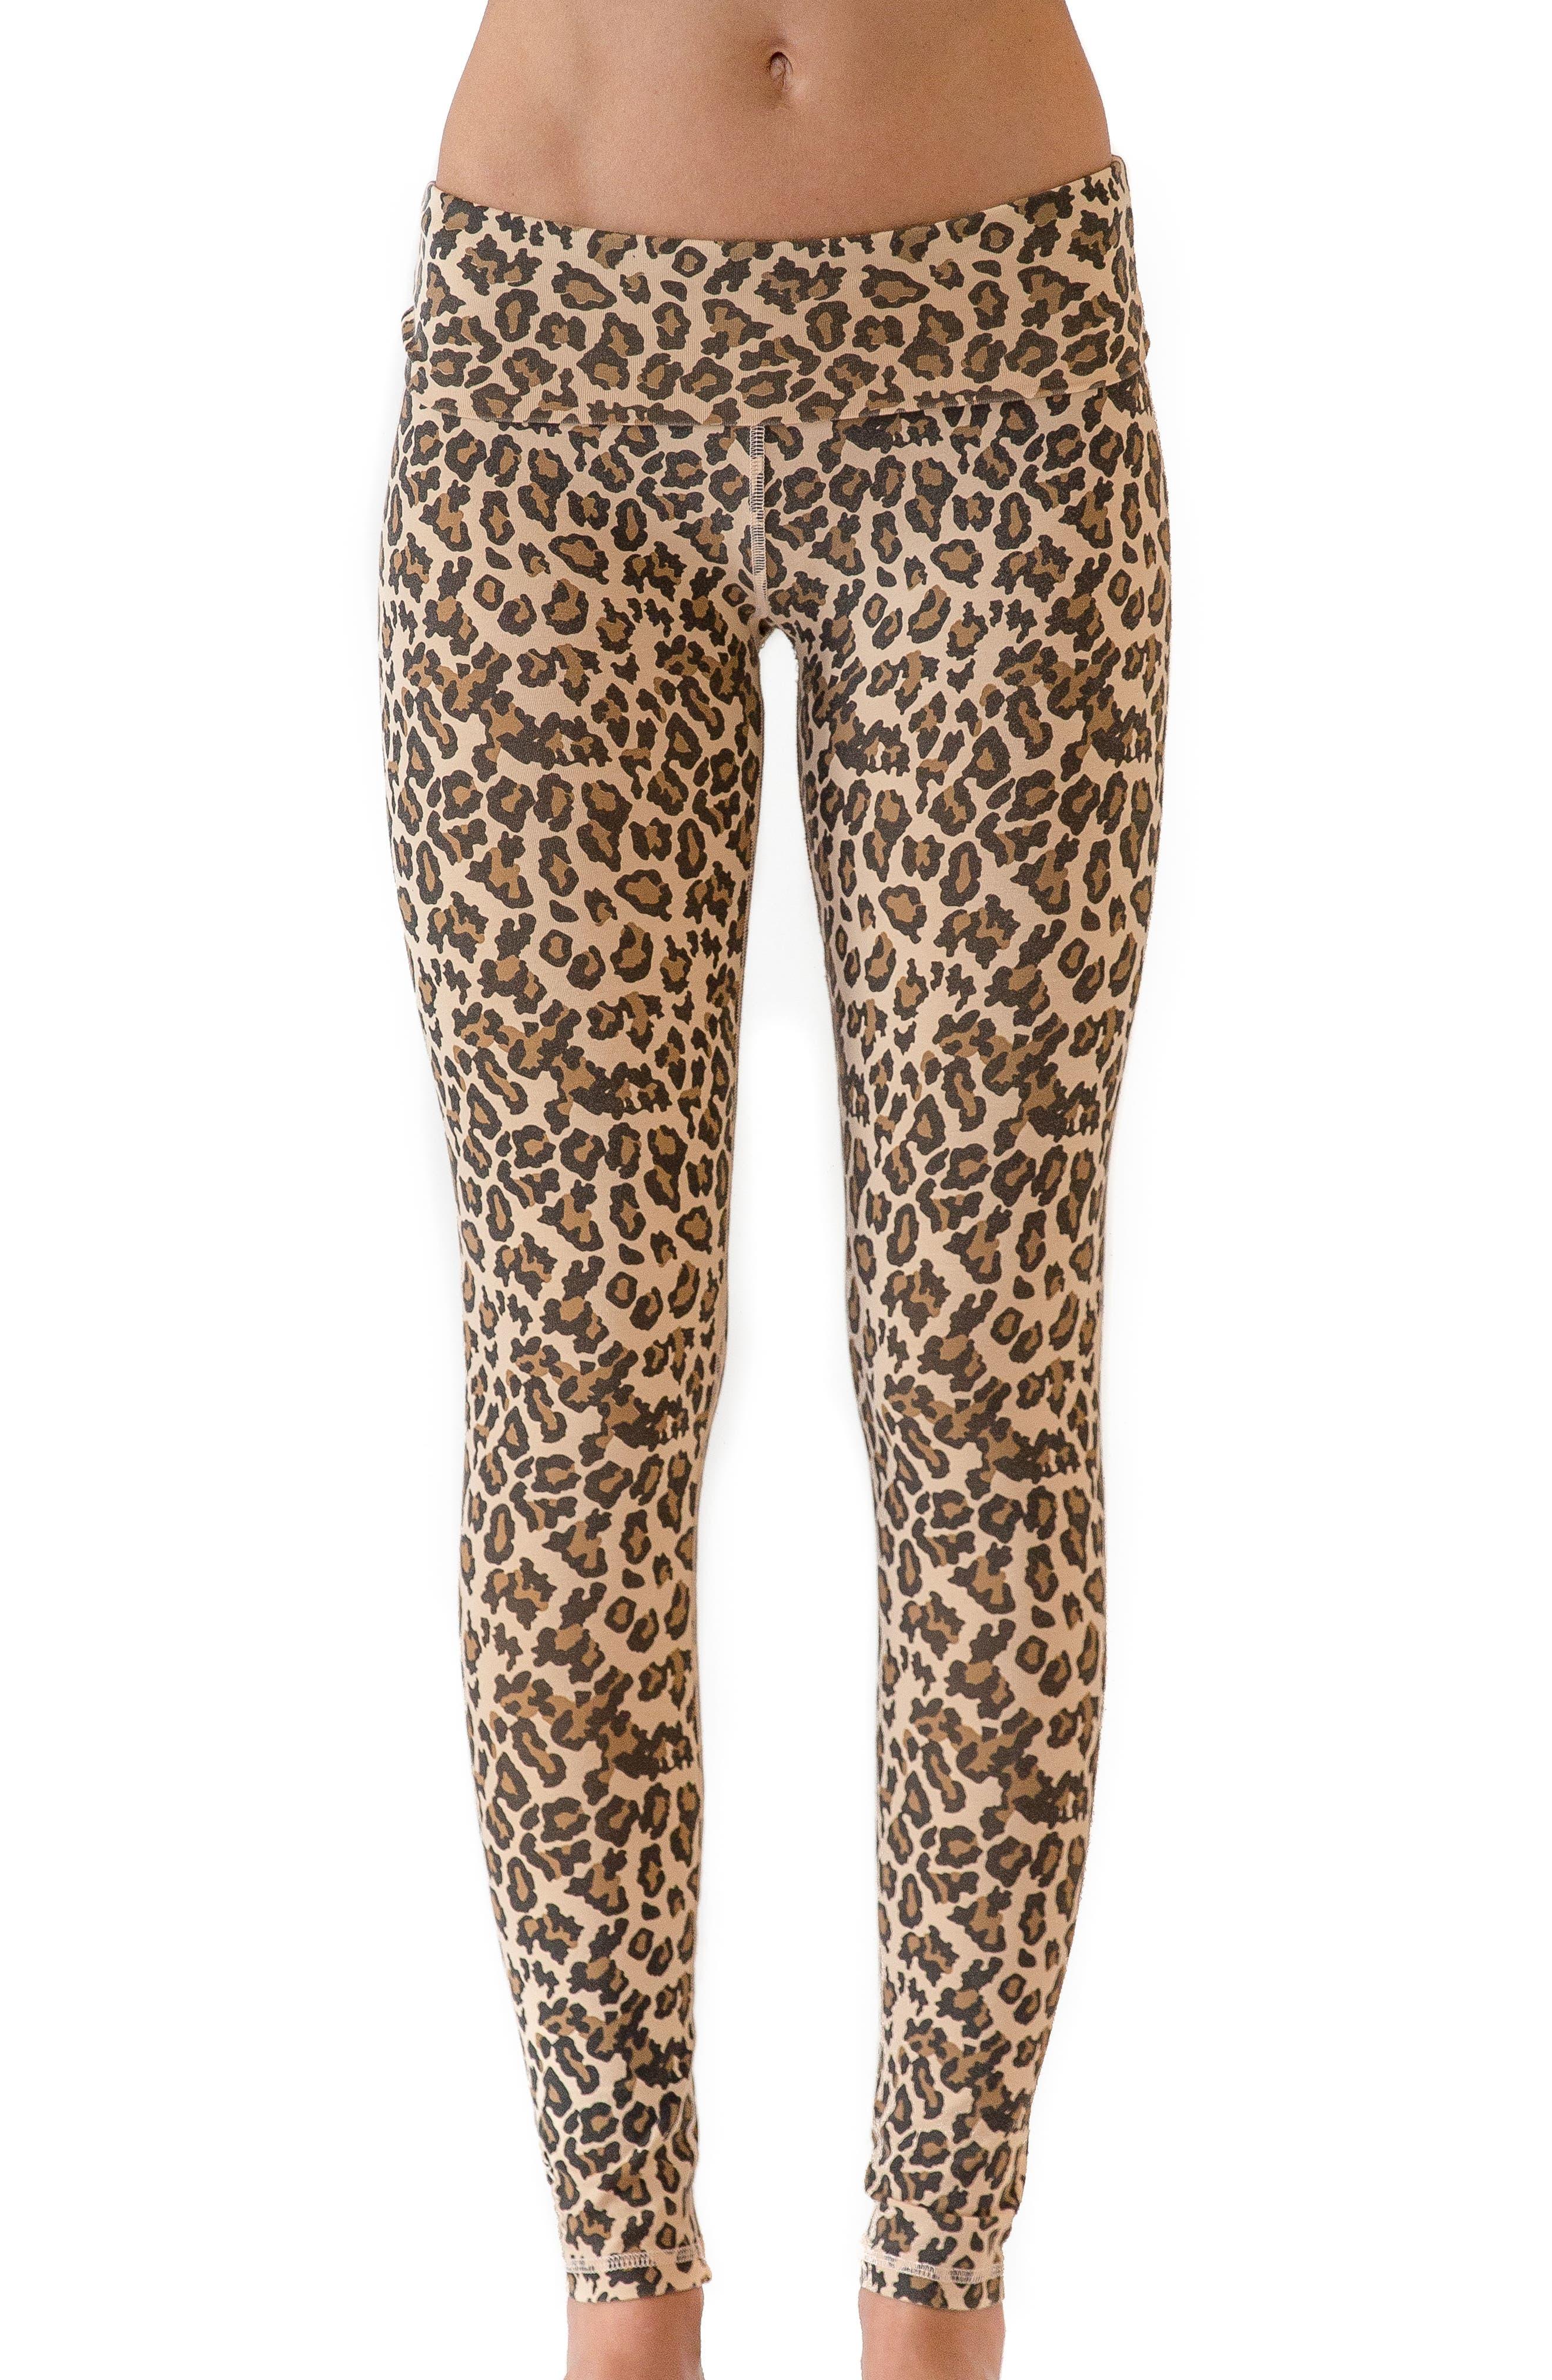 Main Image - Ragdoll Leopard Print Leggings